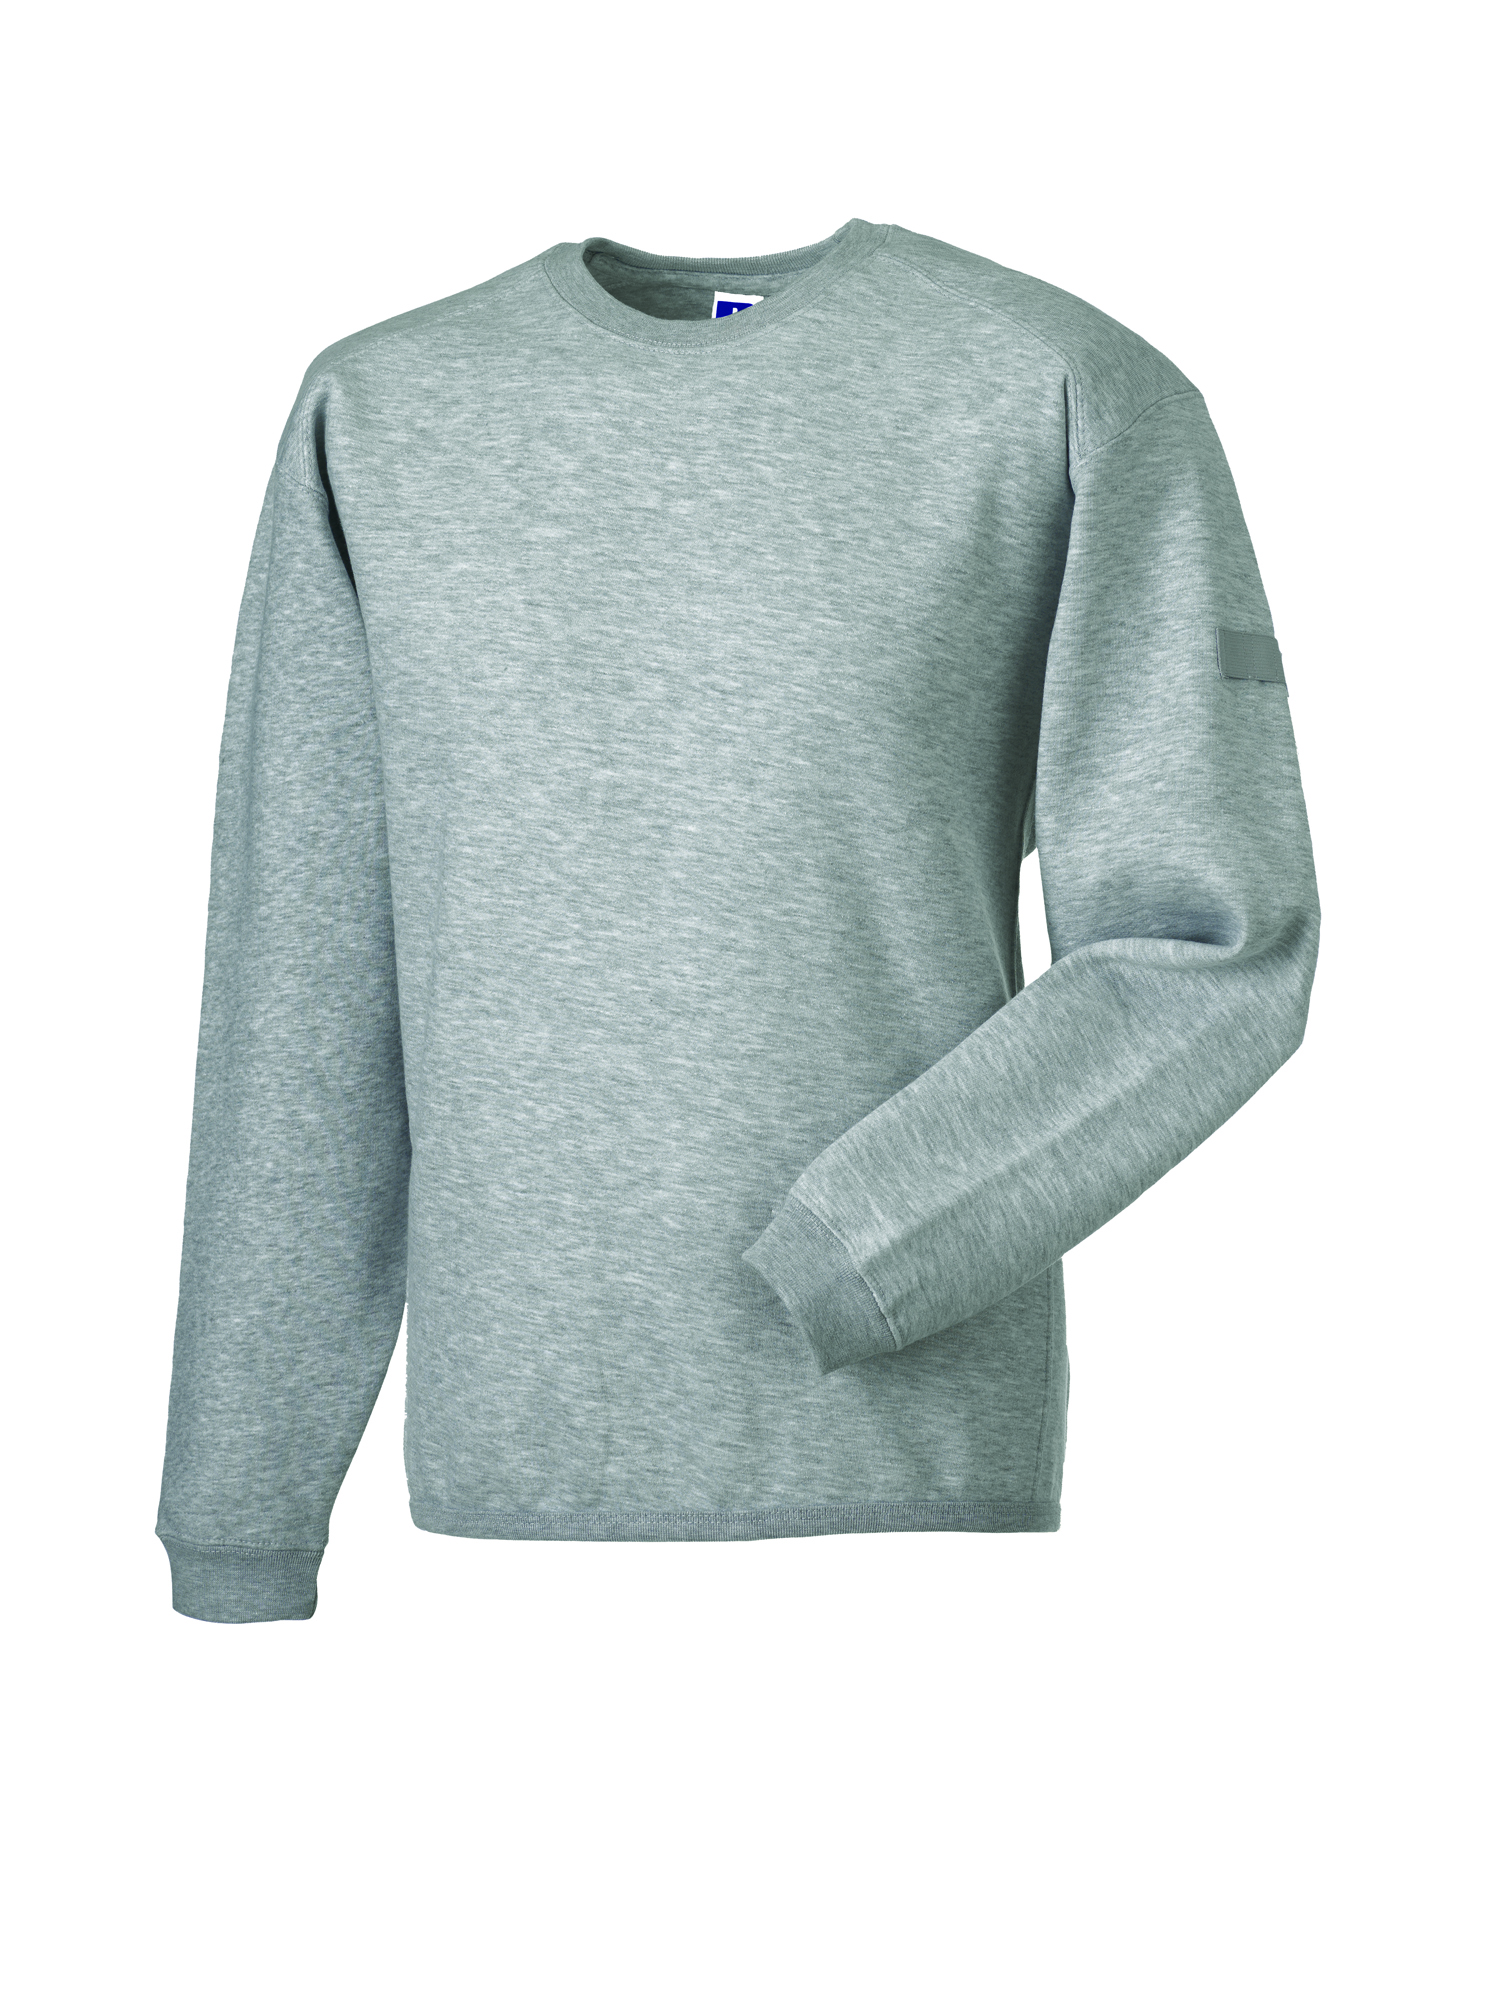 Heavy Duty Crewneck Sweatshirt - Light Oxford - S